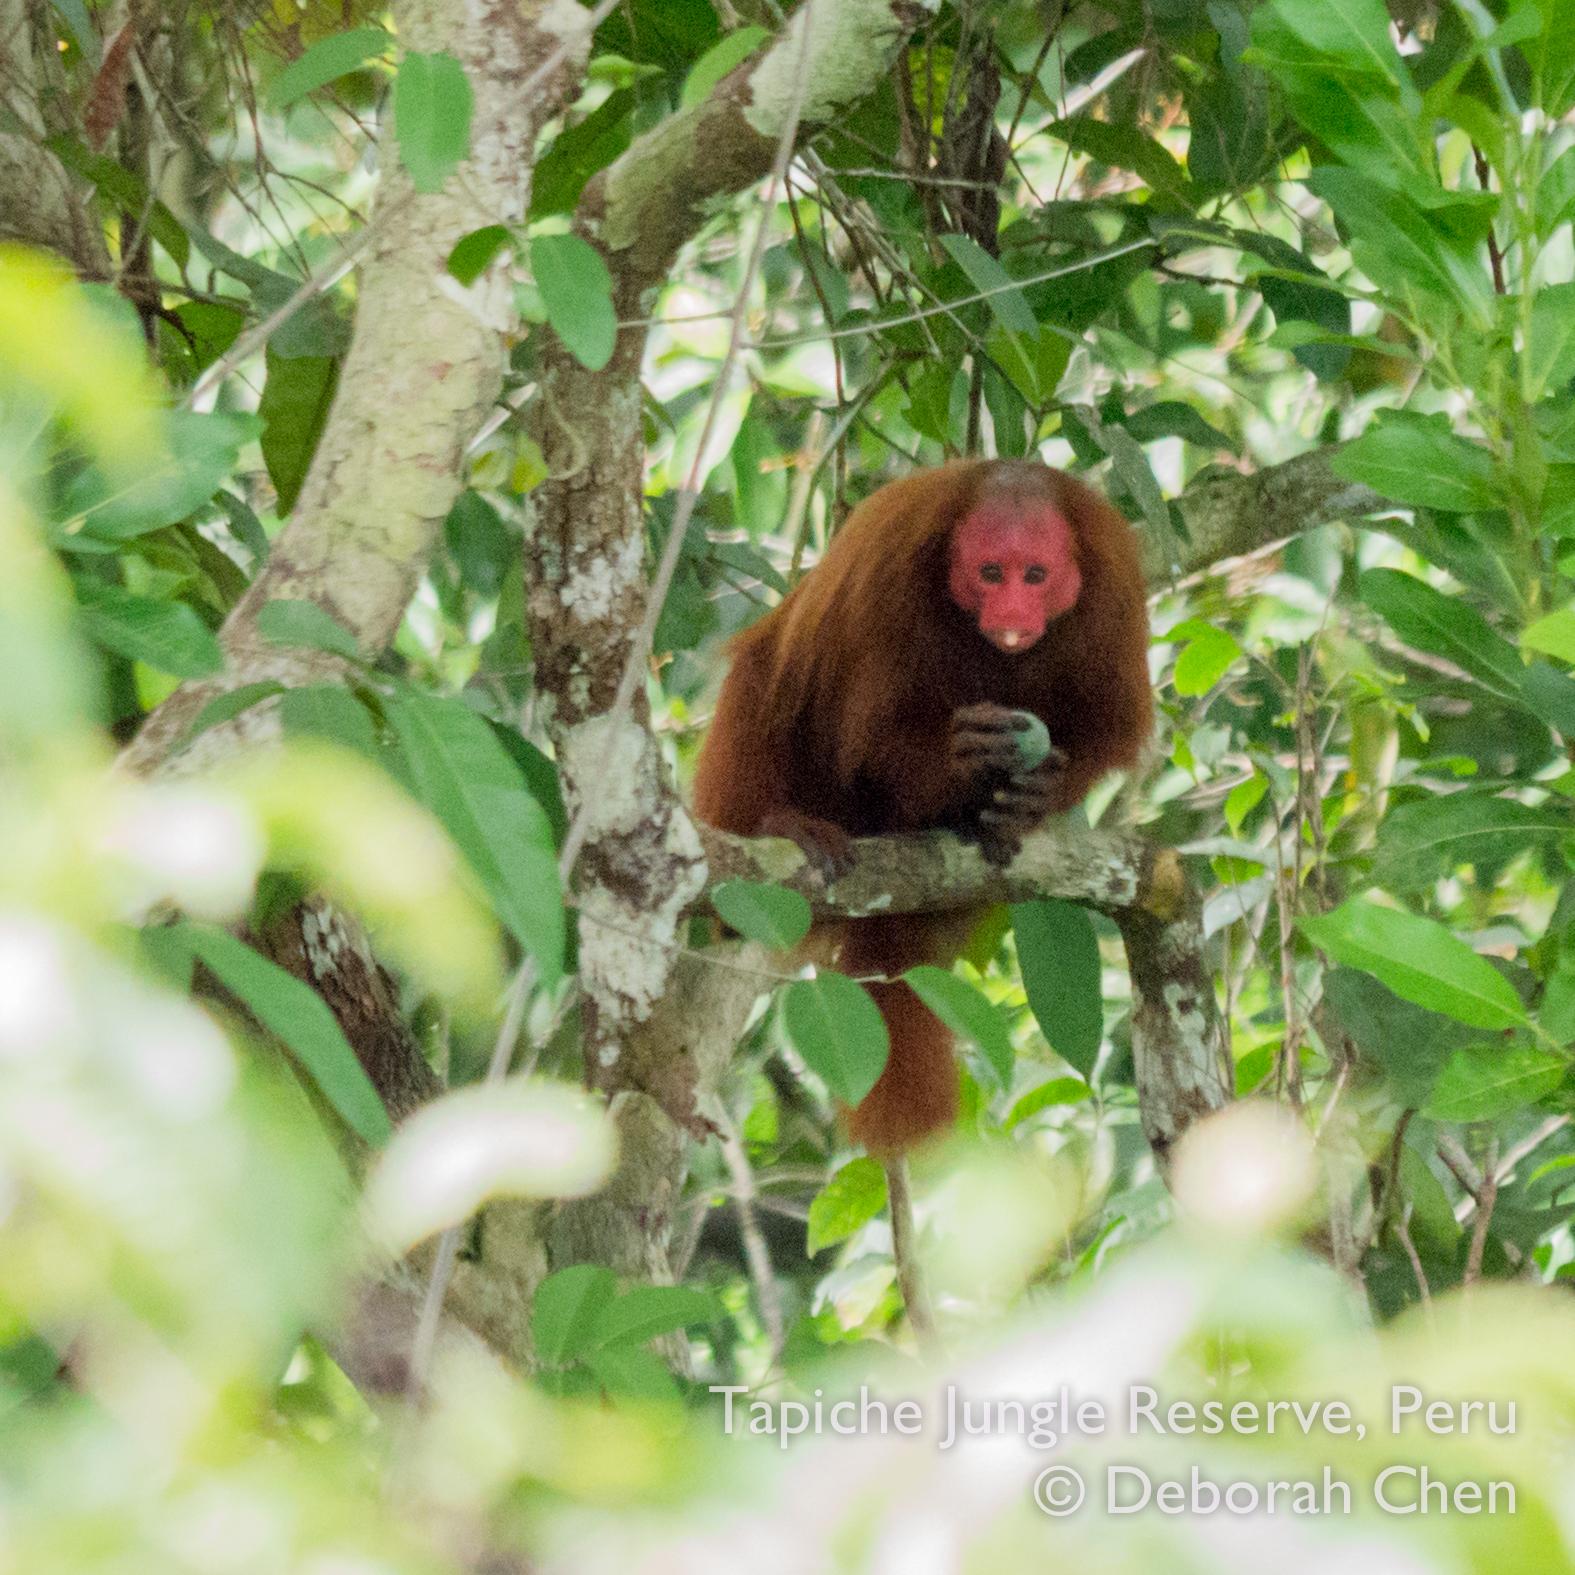 Female red bald uakari monkey stuffing her cheeks (literally)